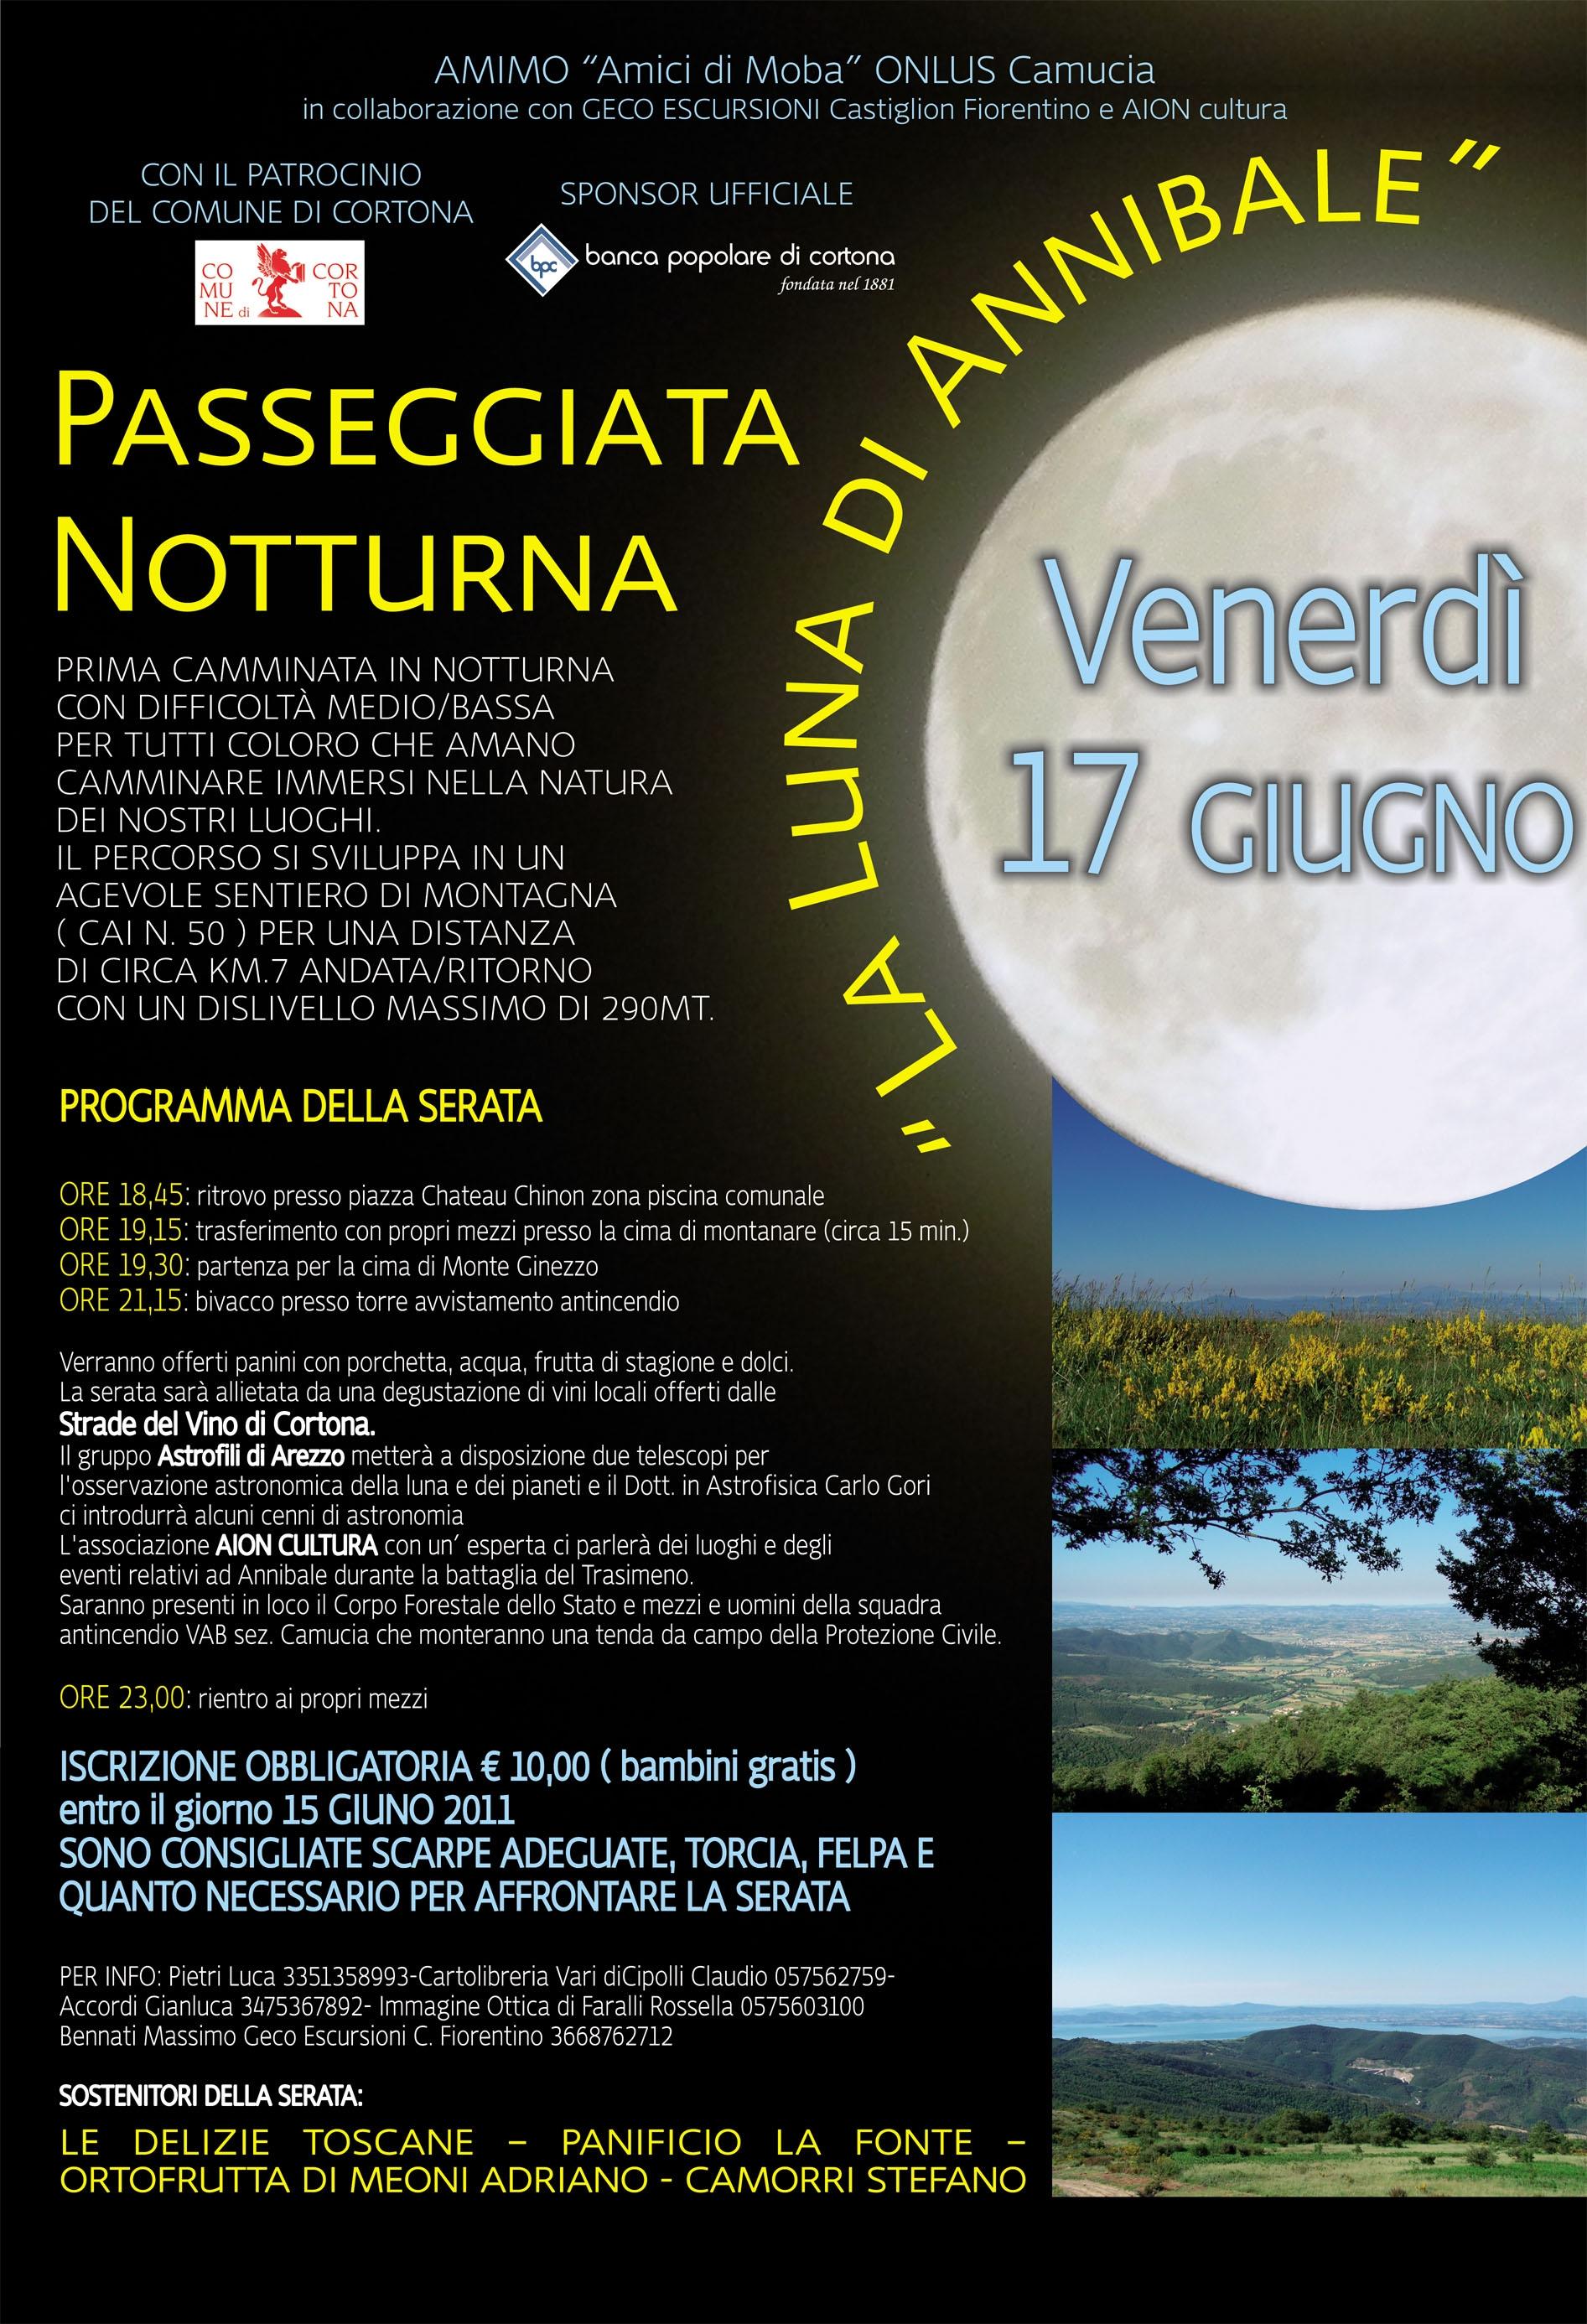 Cortona: Passeggiata notturna organizzata dalla Onlus